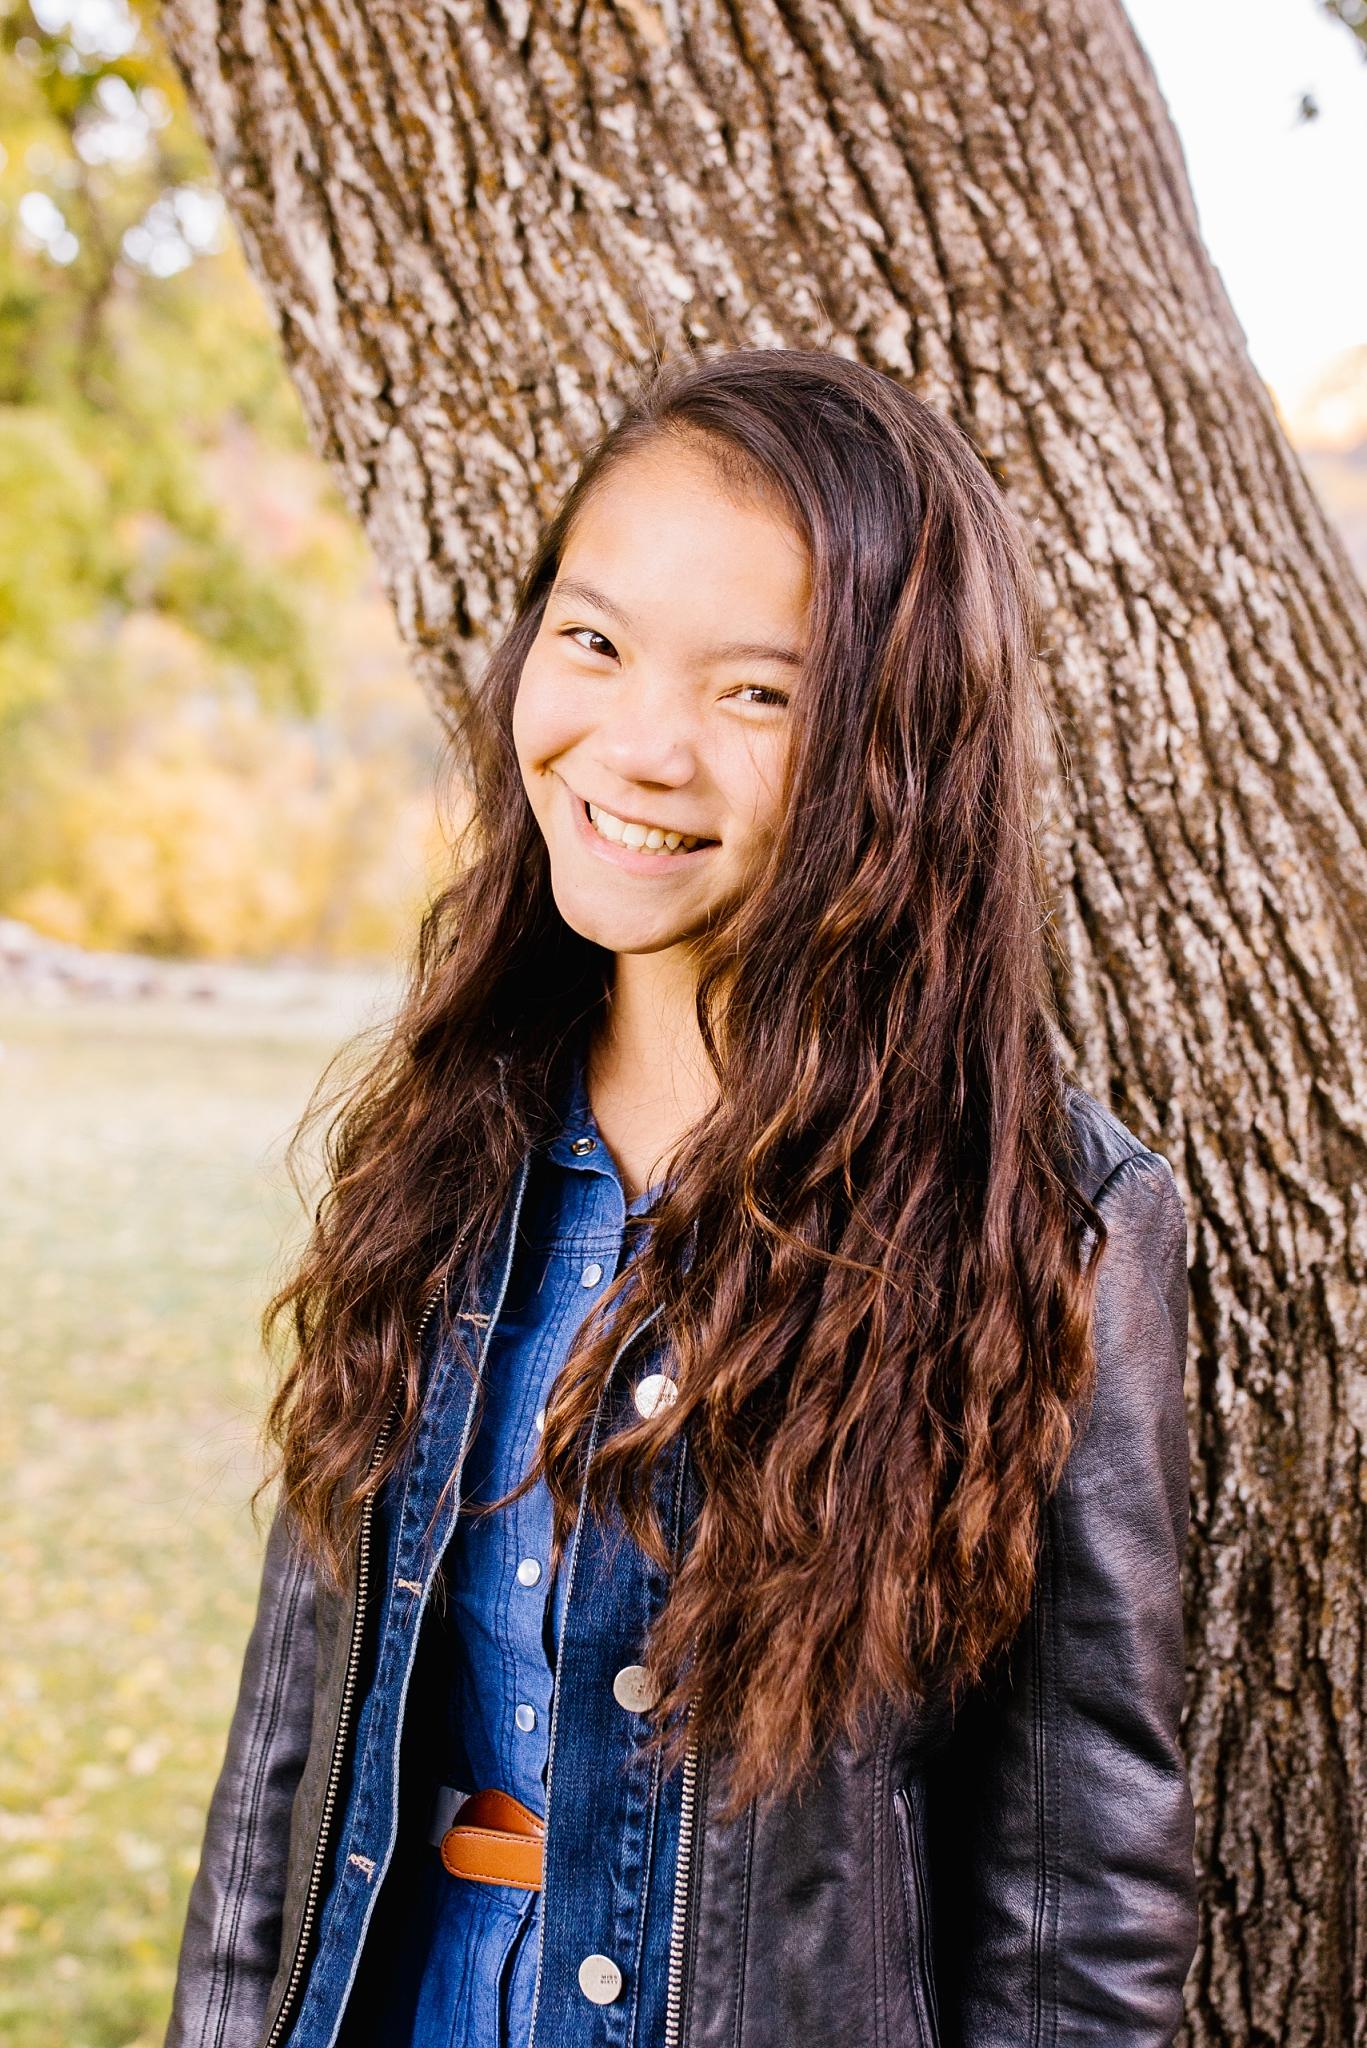 Qian-46_Lizzie-B-Imagery-Utah-Family-Photographer-Lifestyle-Photography-Salt-Lake-City-Park-City-Utah-County-Jolleys-Ranch-Hobble-Creek-Canyon-Springville-Utah.jpg